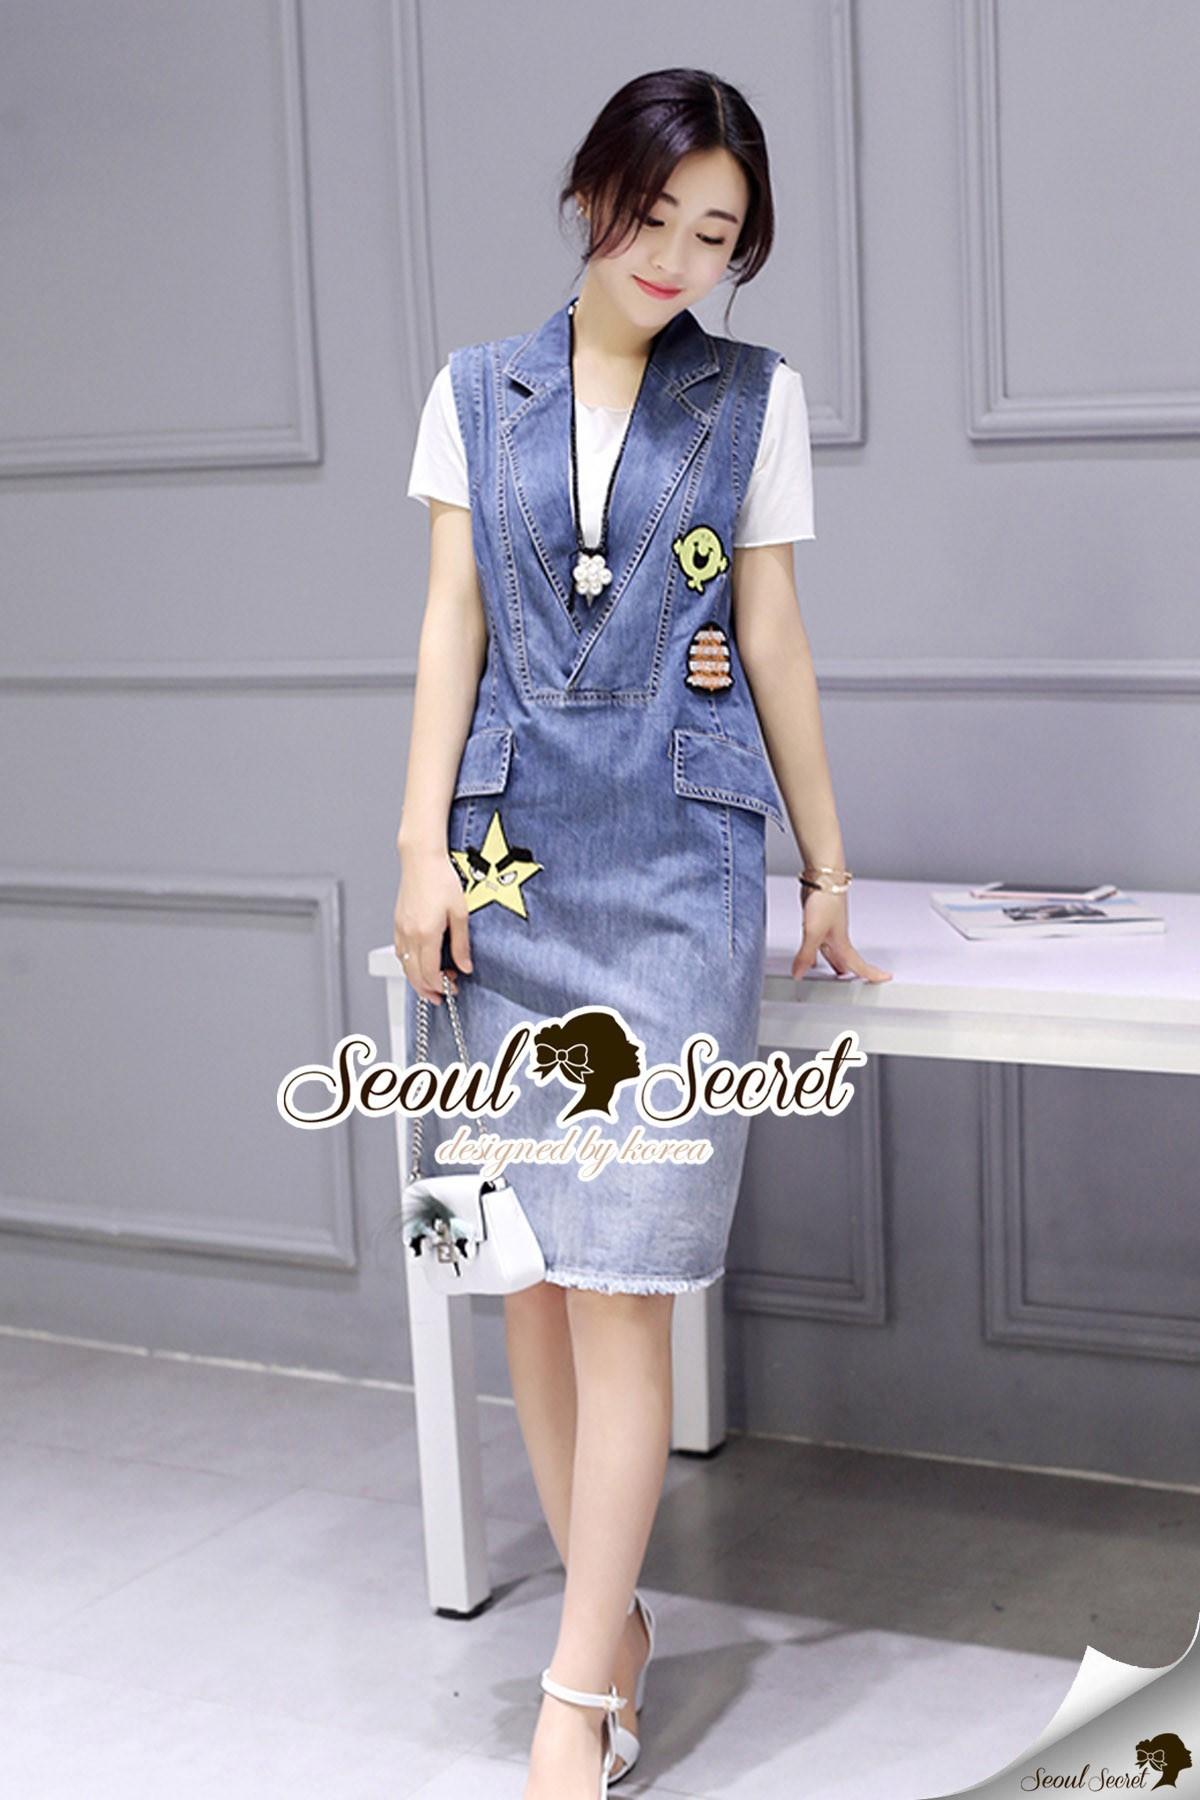 Seoul Secret Say's... Smily Denim Chic Blouse Dress Set